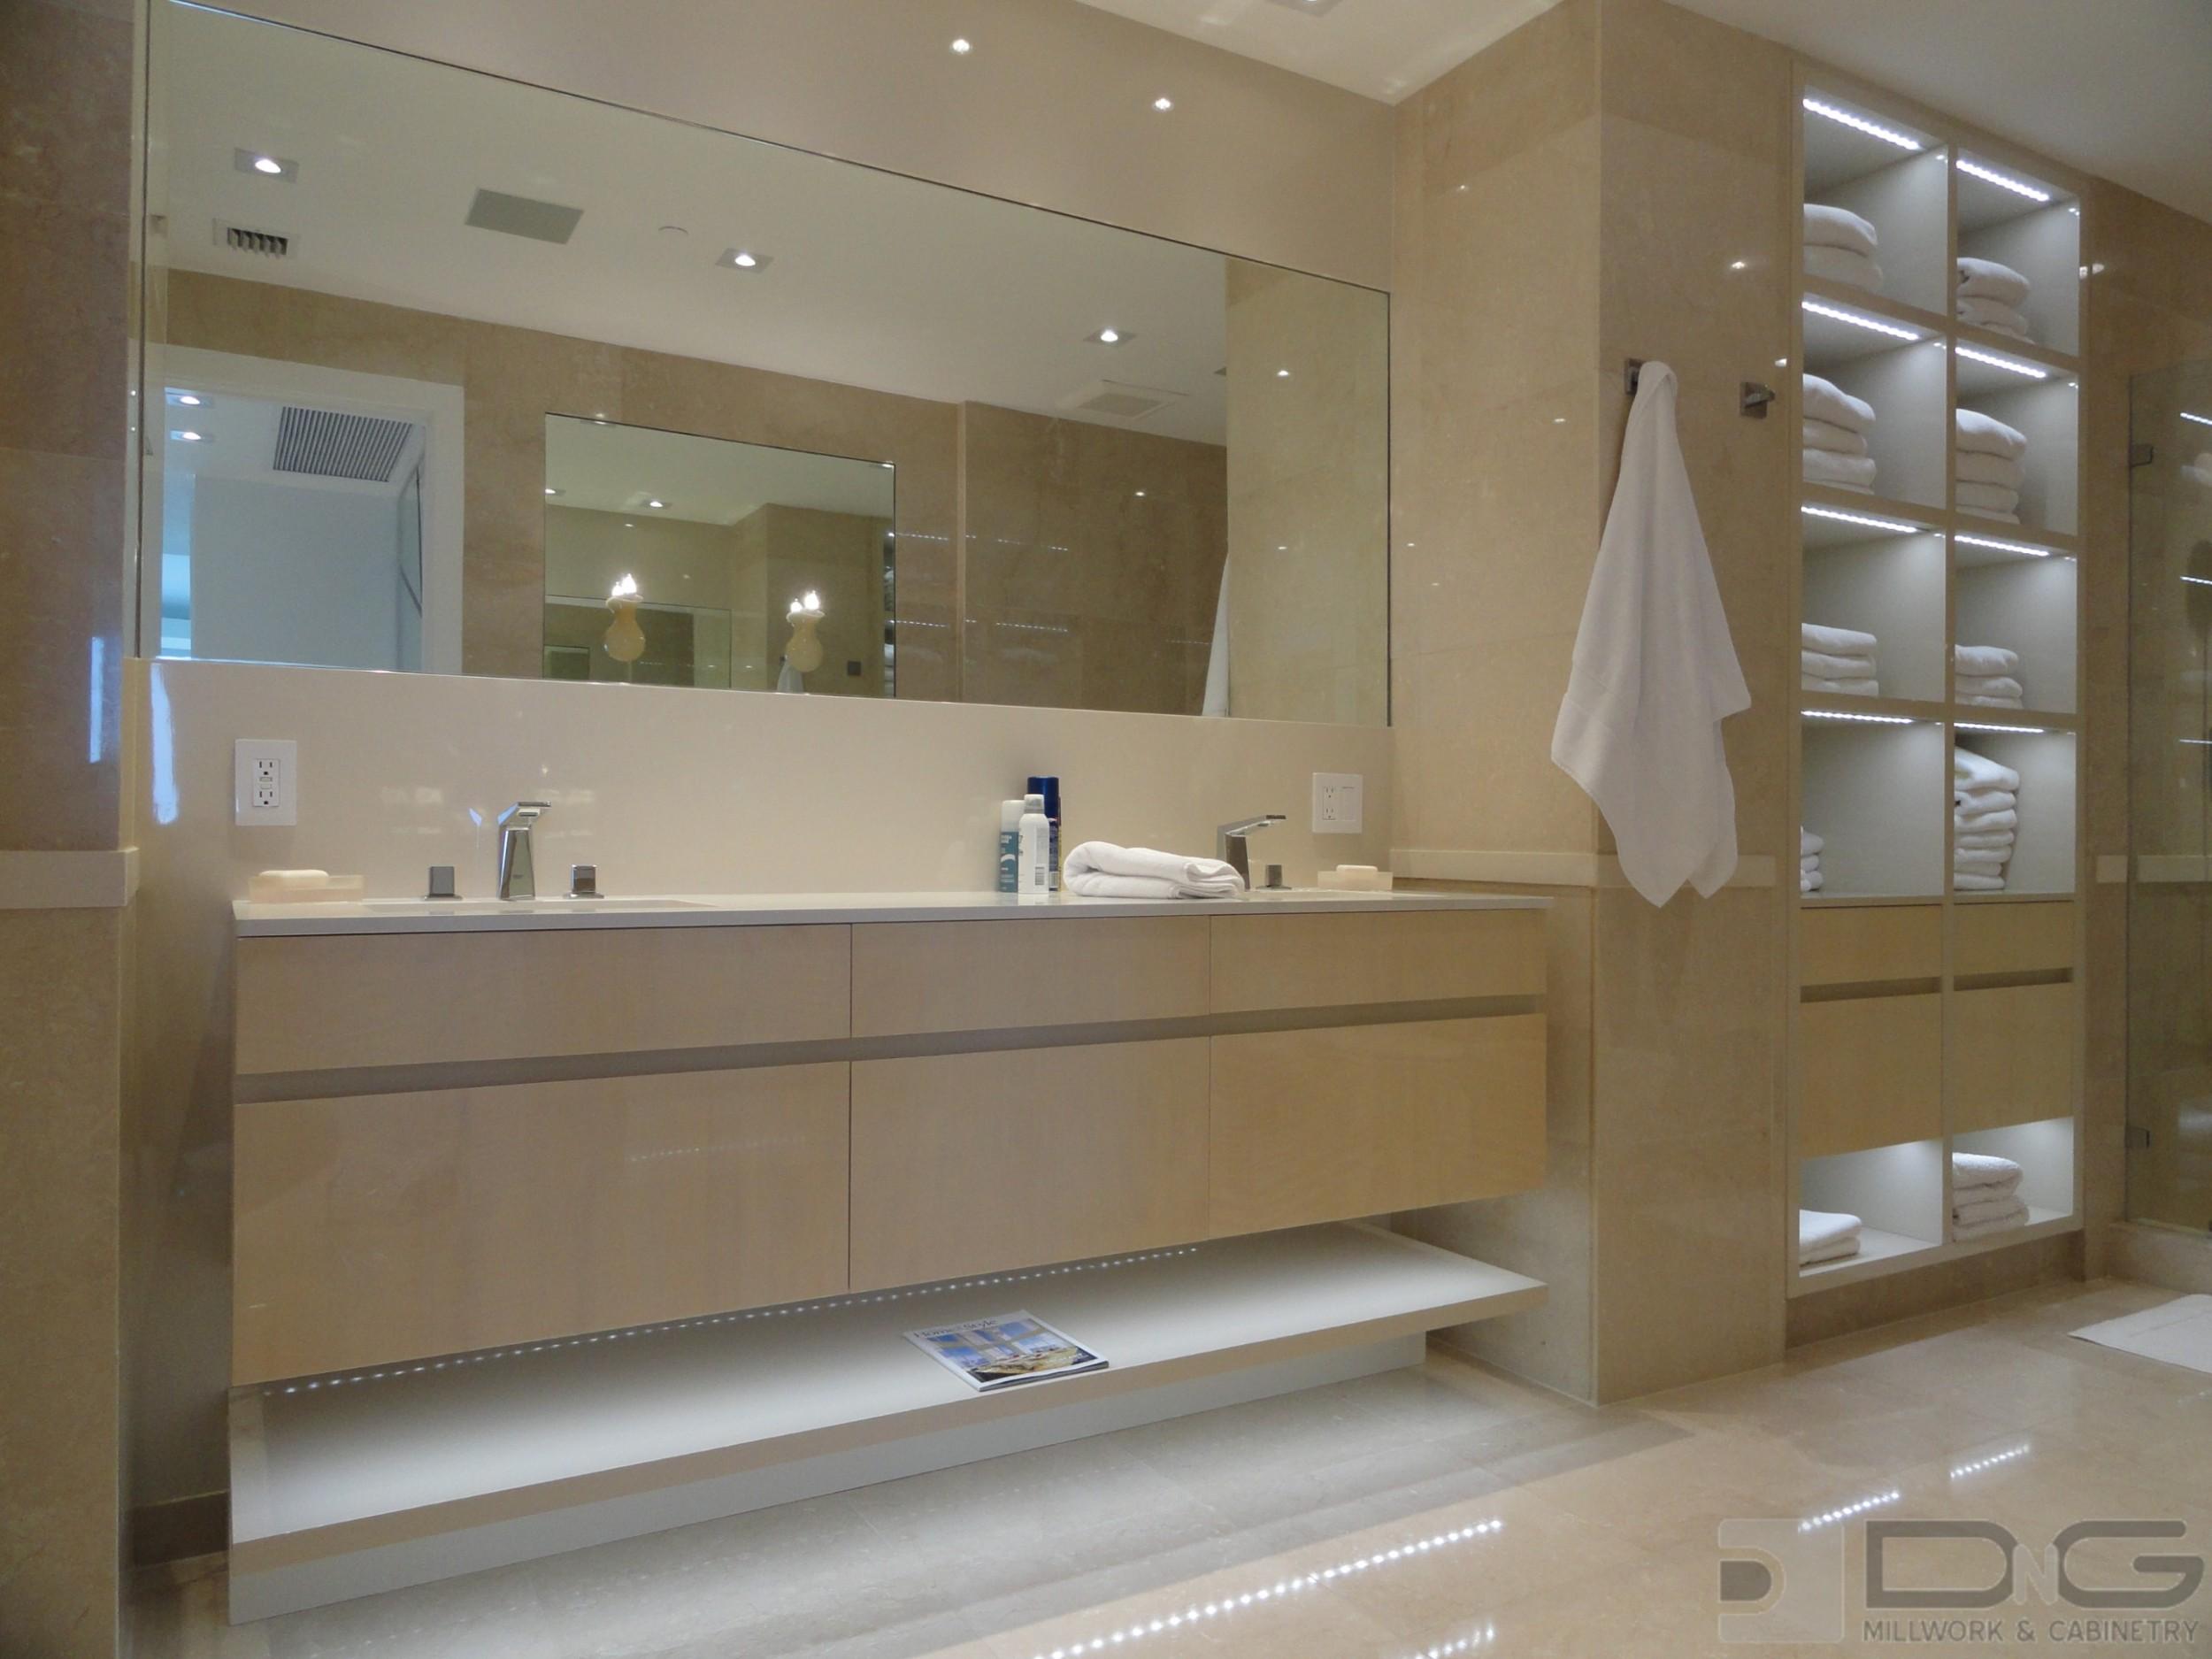 Best Kitchen Gallery: Custom Bathroom Cabi S Modern Minimalist Bathroom Custom Cabi S of Custom Bathroom Design  on rachelxblog.com